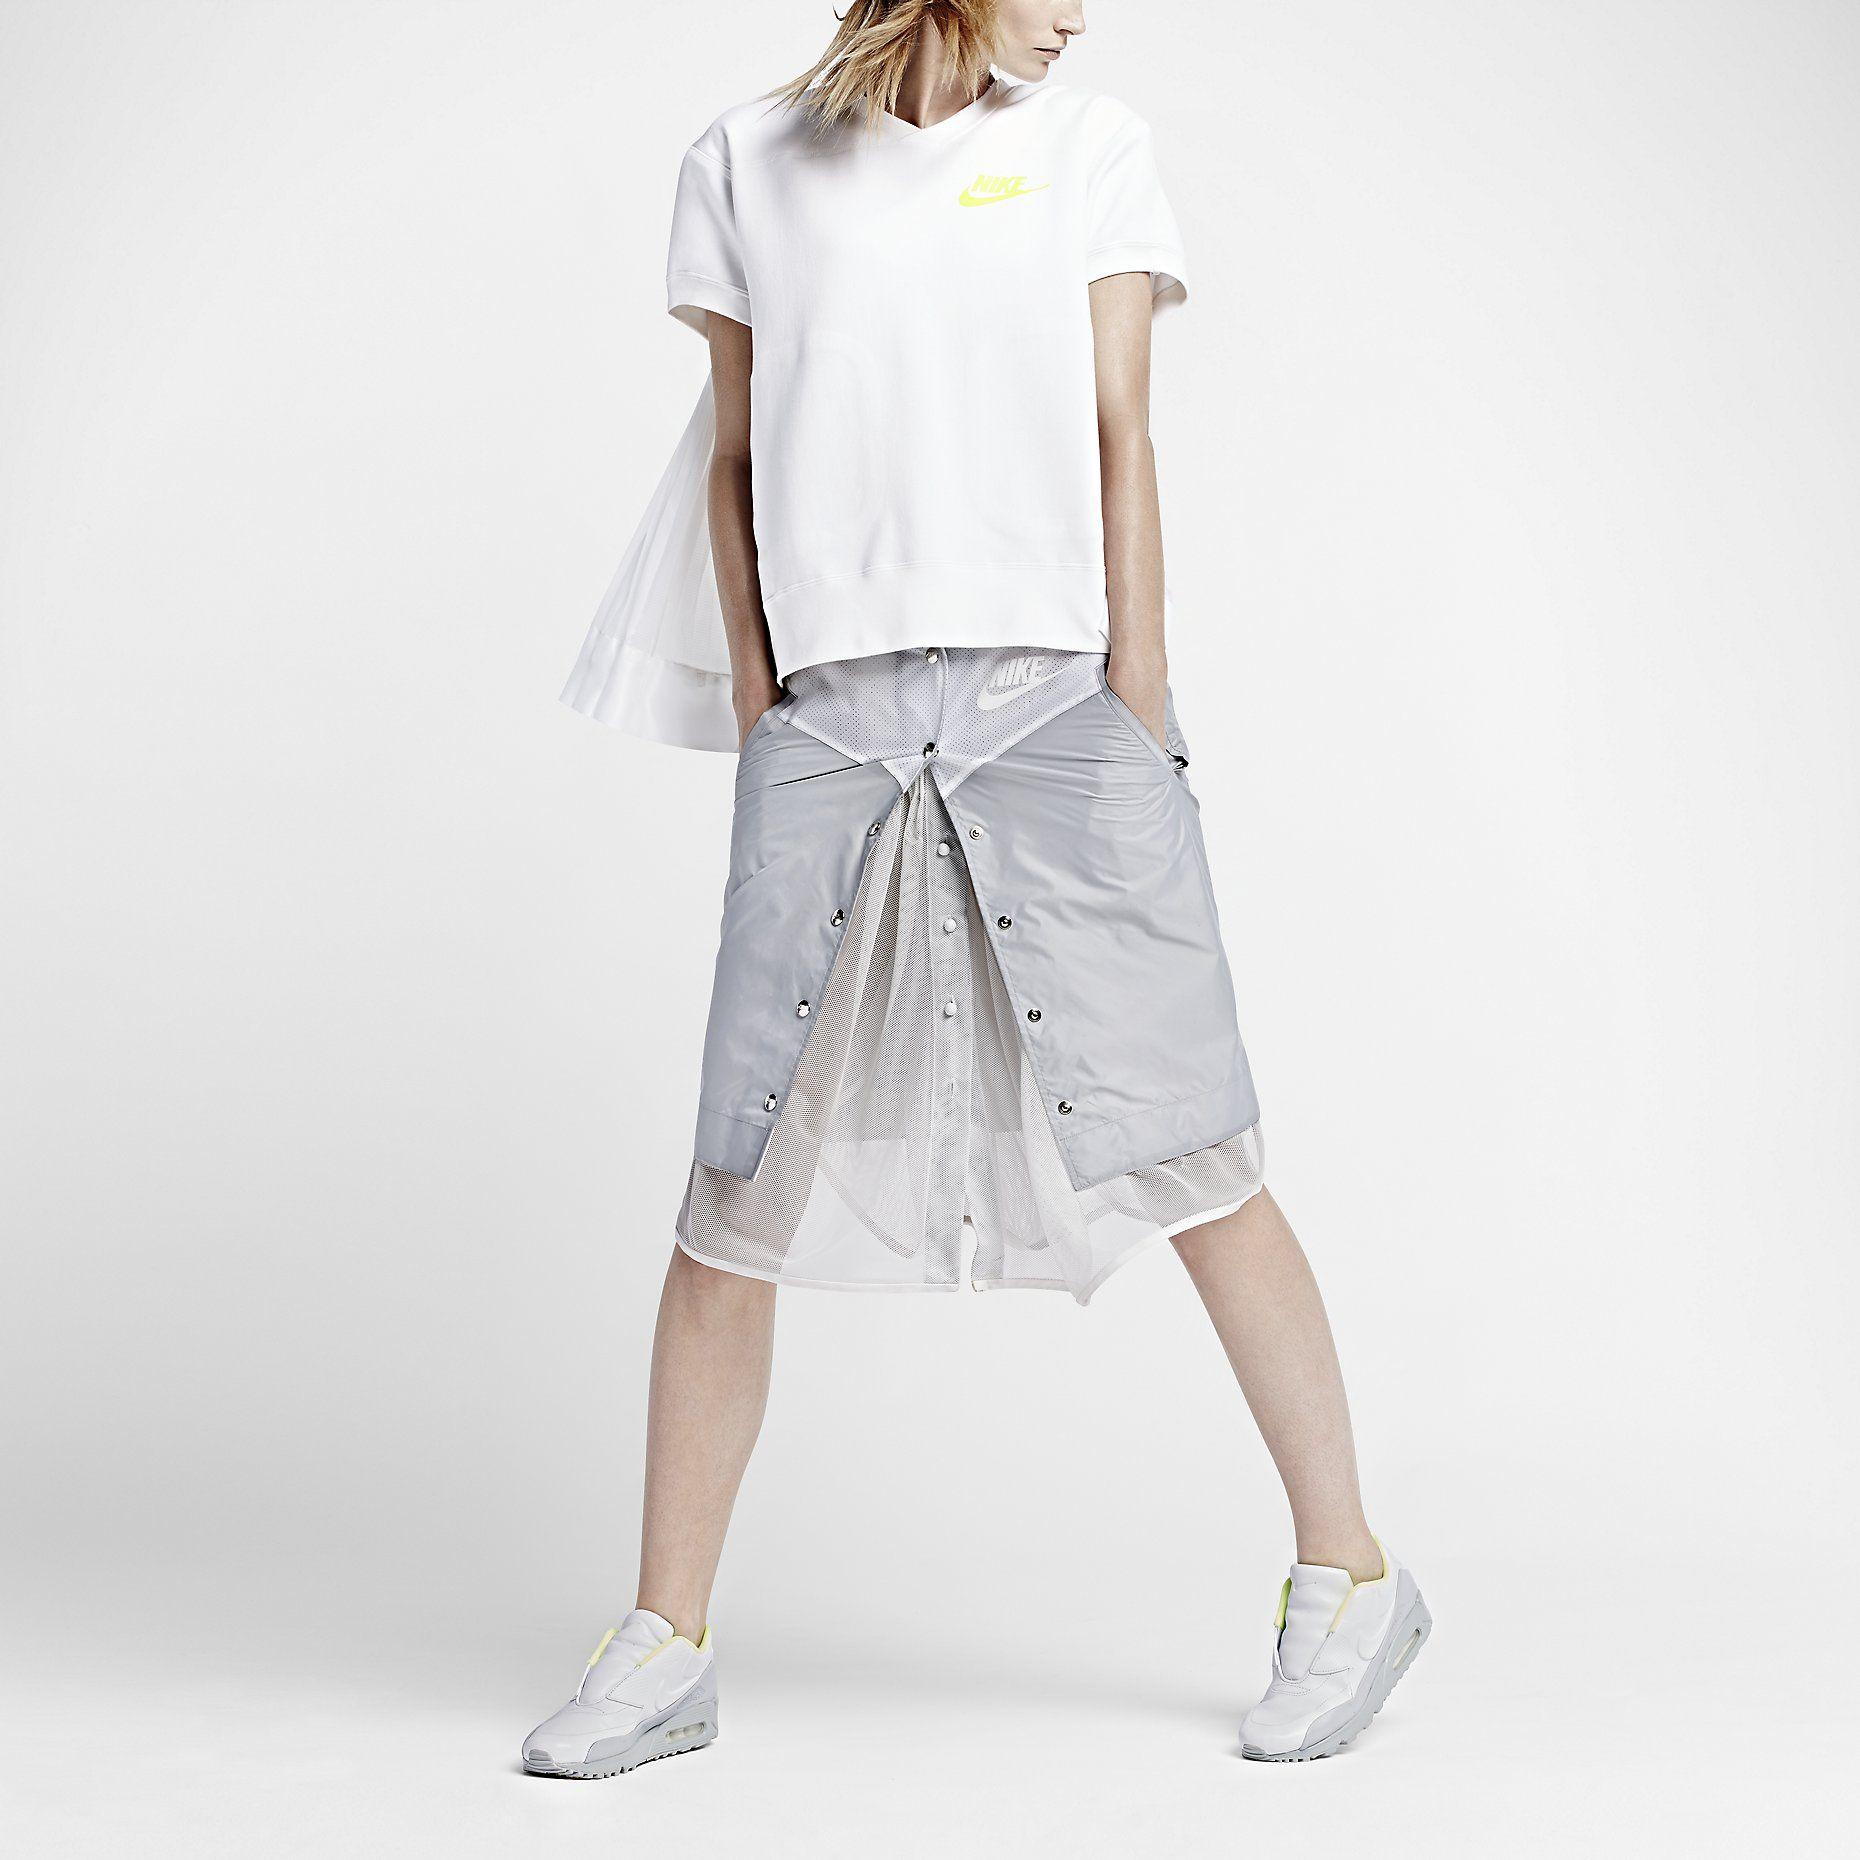 Sacai Nike Store Sacki Women's X Windrunner Nikelab Skirt 1wP5qn6